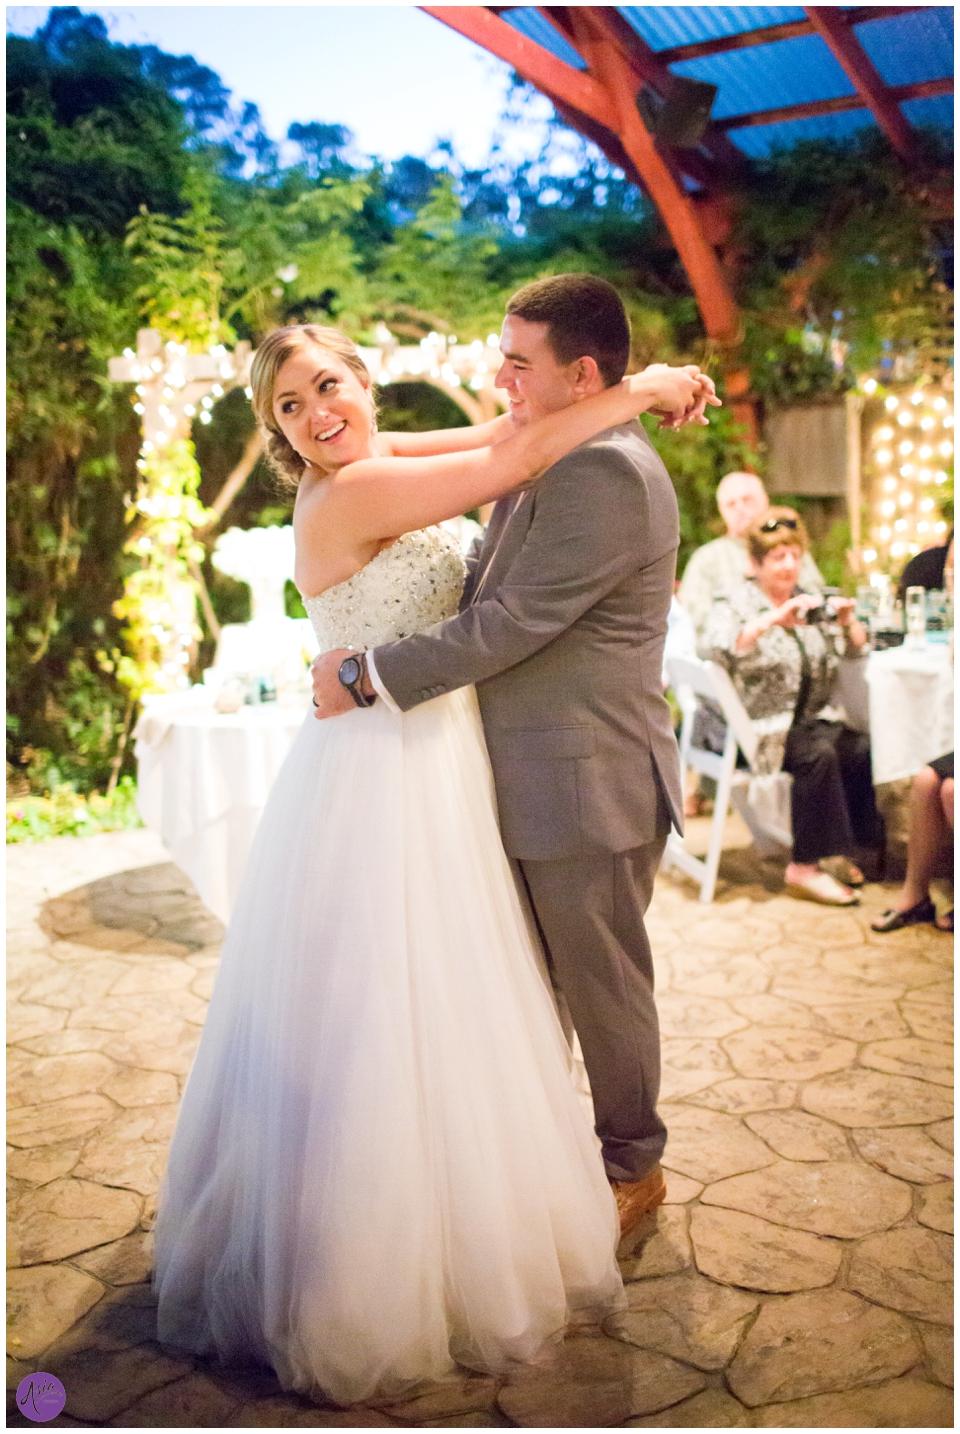 Wedding Photographer Asia Croson Photography San Luis Obispo-1036_Asia Croson Photography stomped.jpg